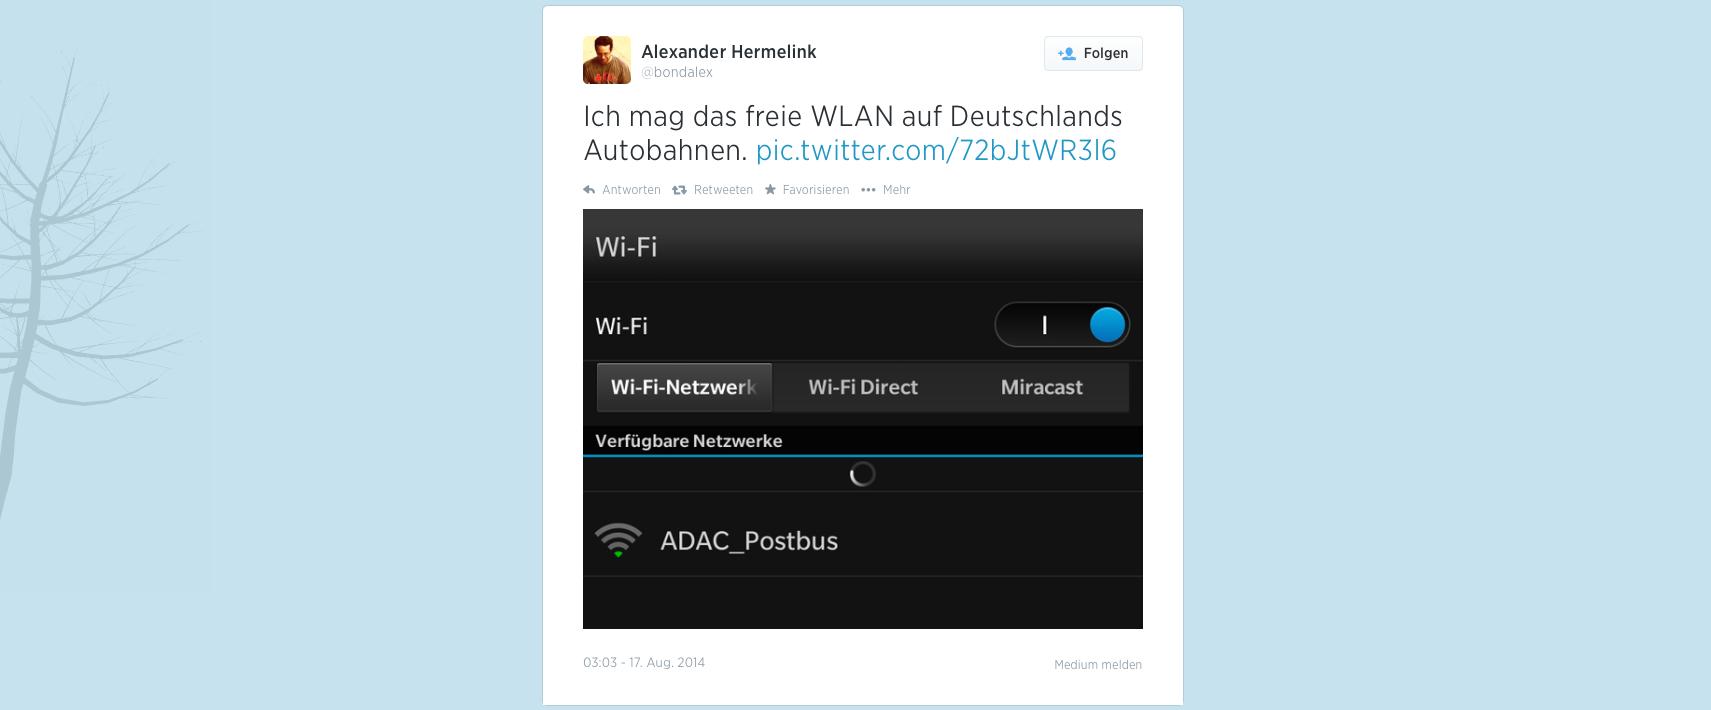 Tweet von Alexander Hermelink, [@bondlatex](https://twitter.com/bondlatex)